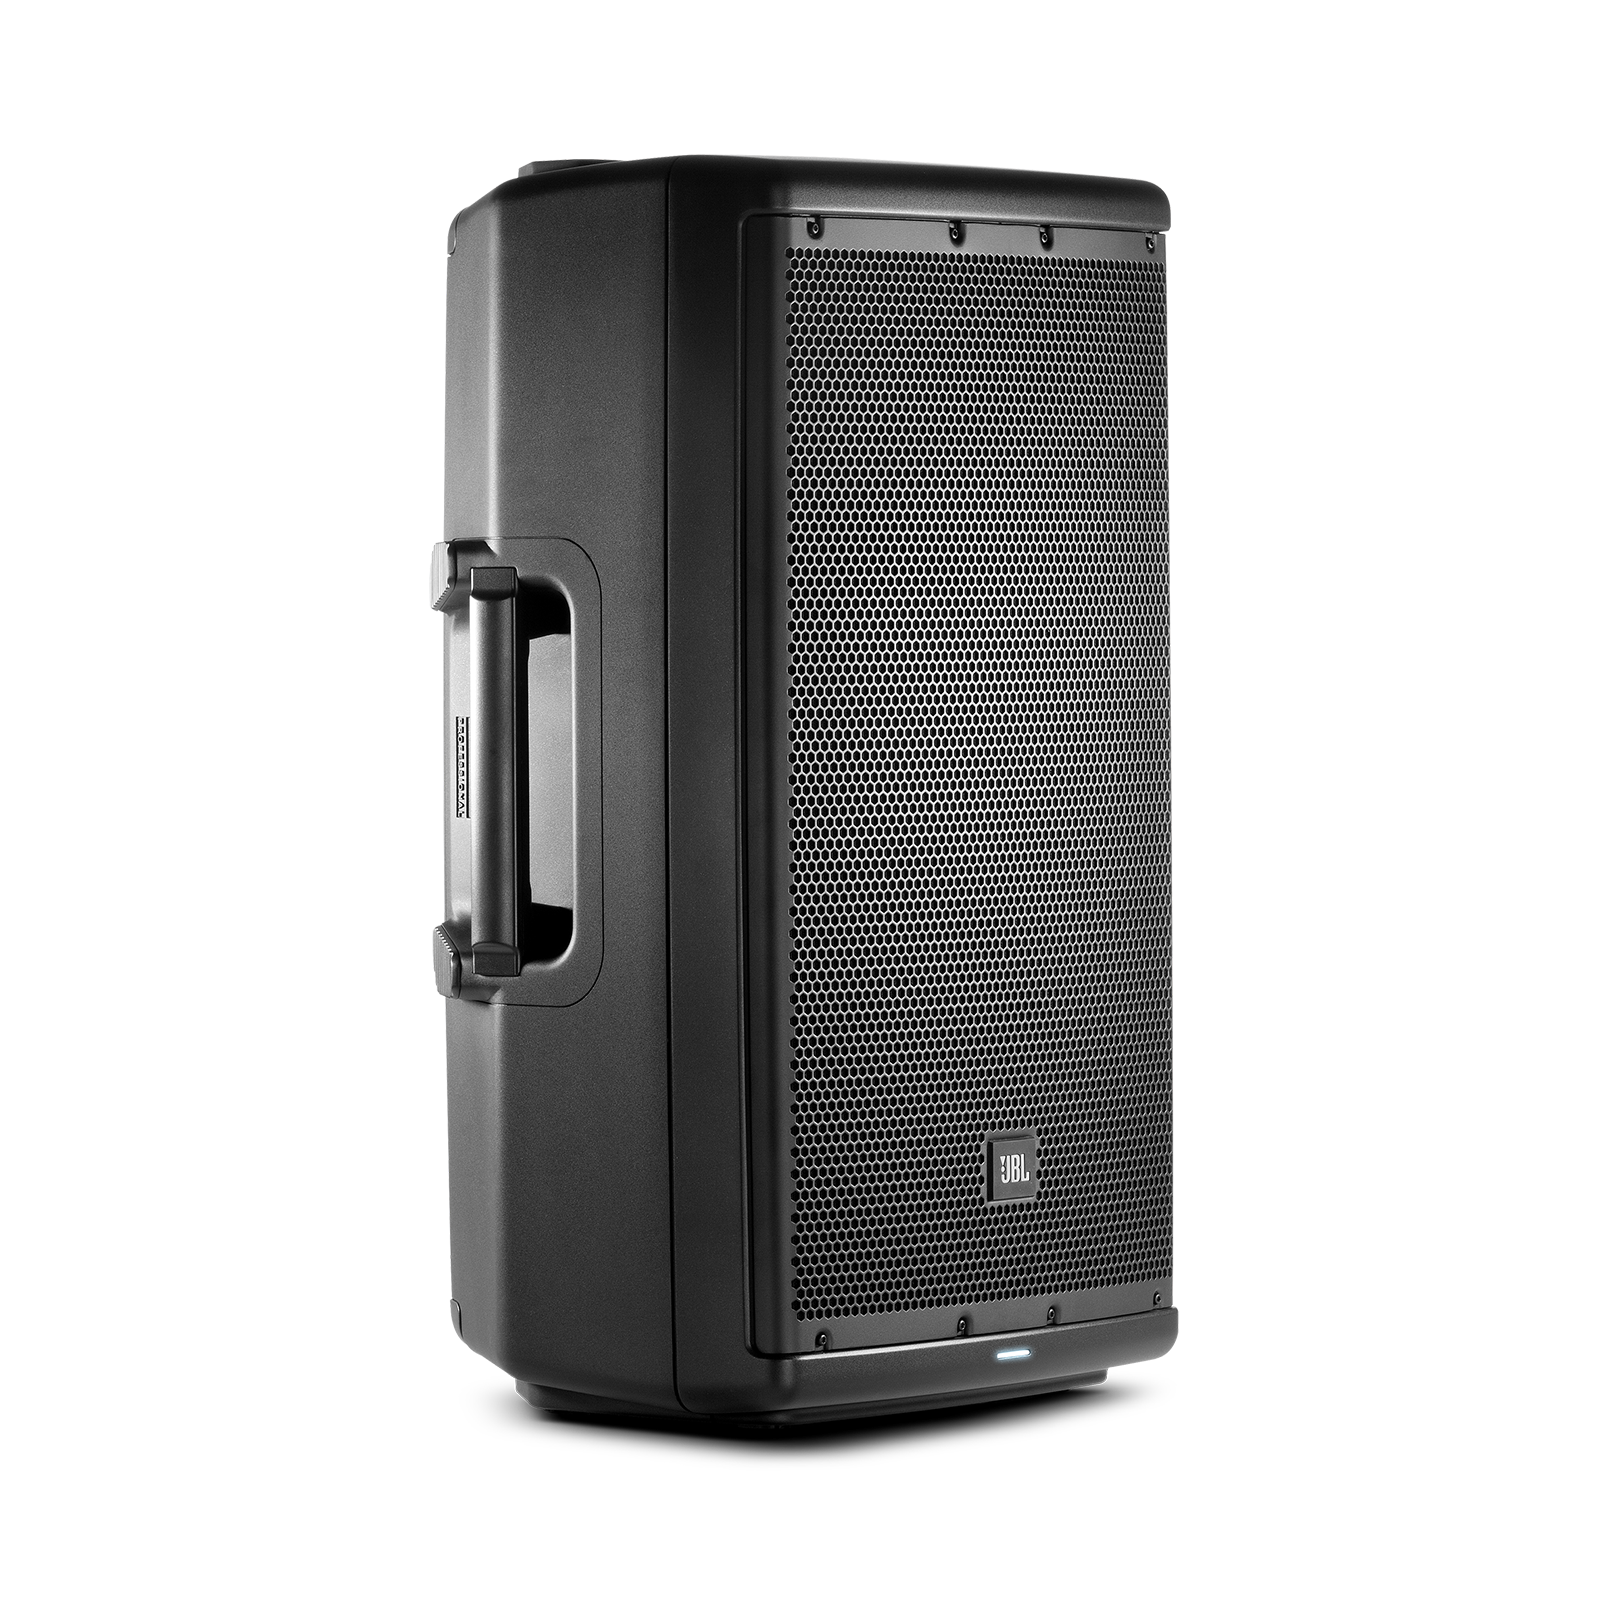 "JBL EON612 - Black - 12"" Two-Way Multipurpose Self-Powered Sound Reinforcement - Detailshot 1"